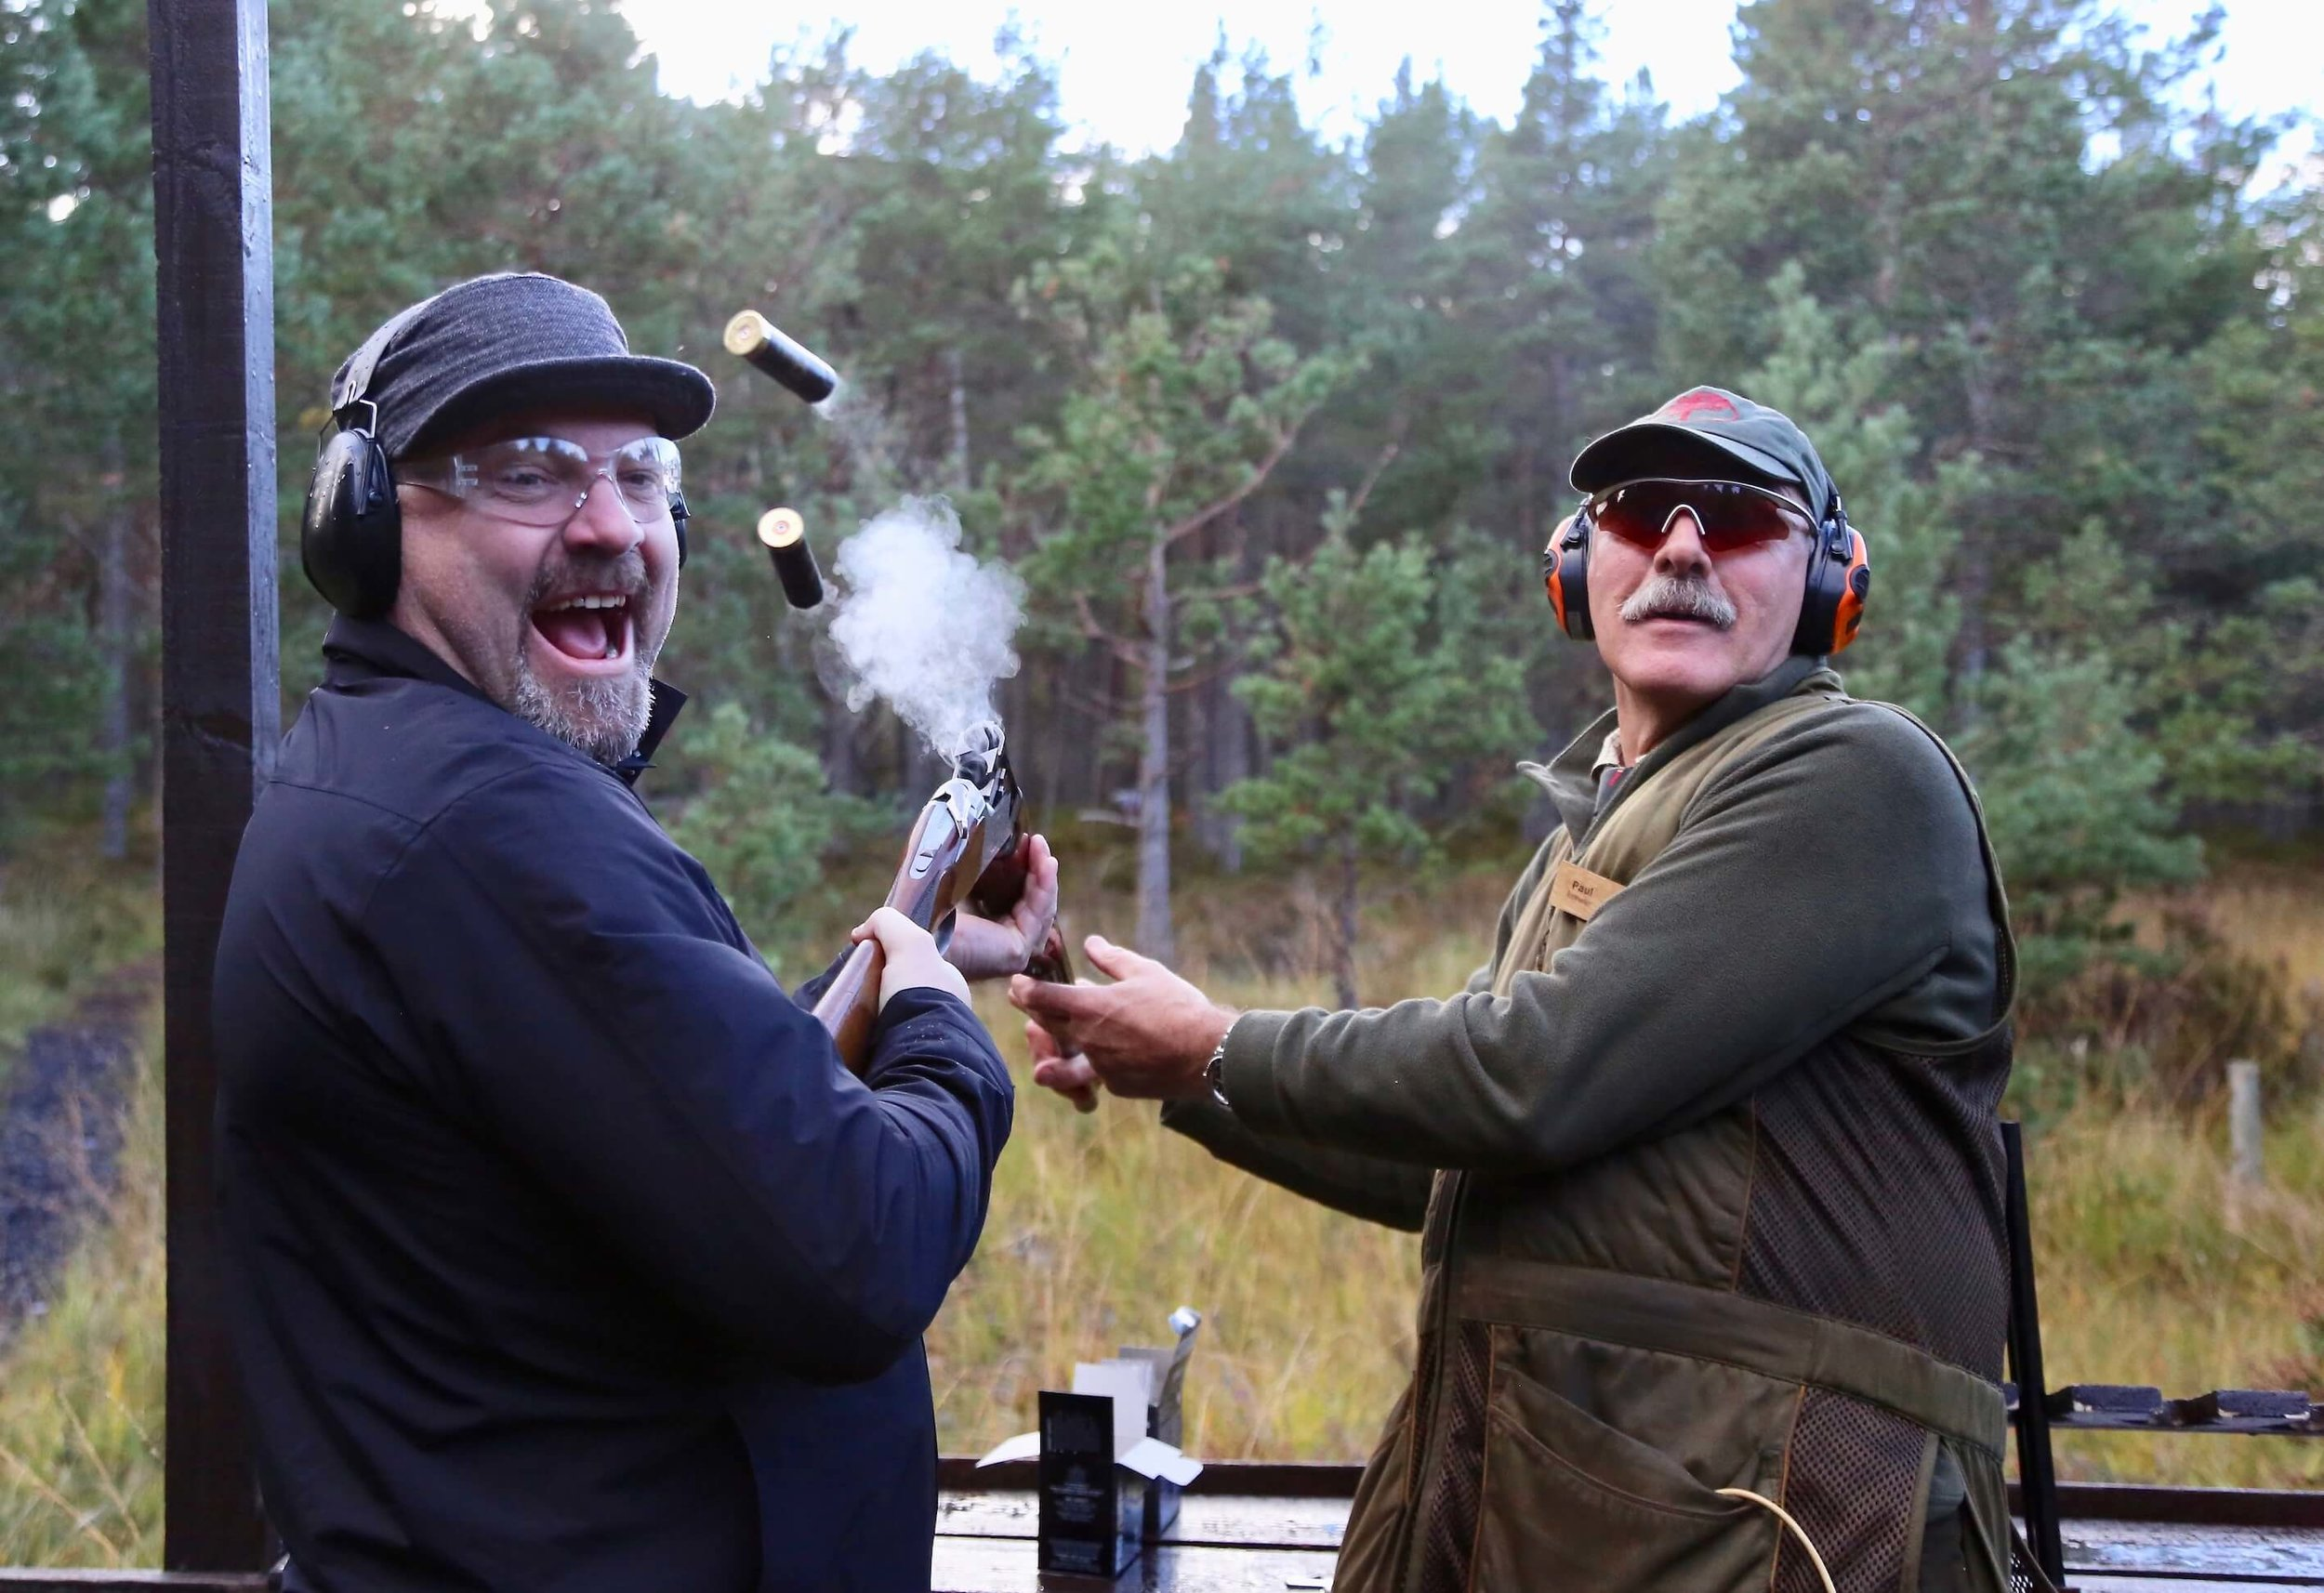 Clay shooting challenge